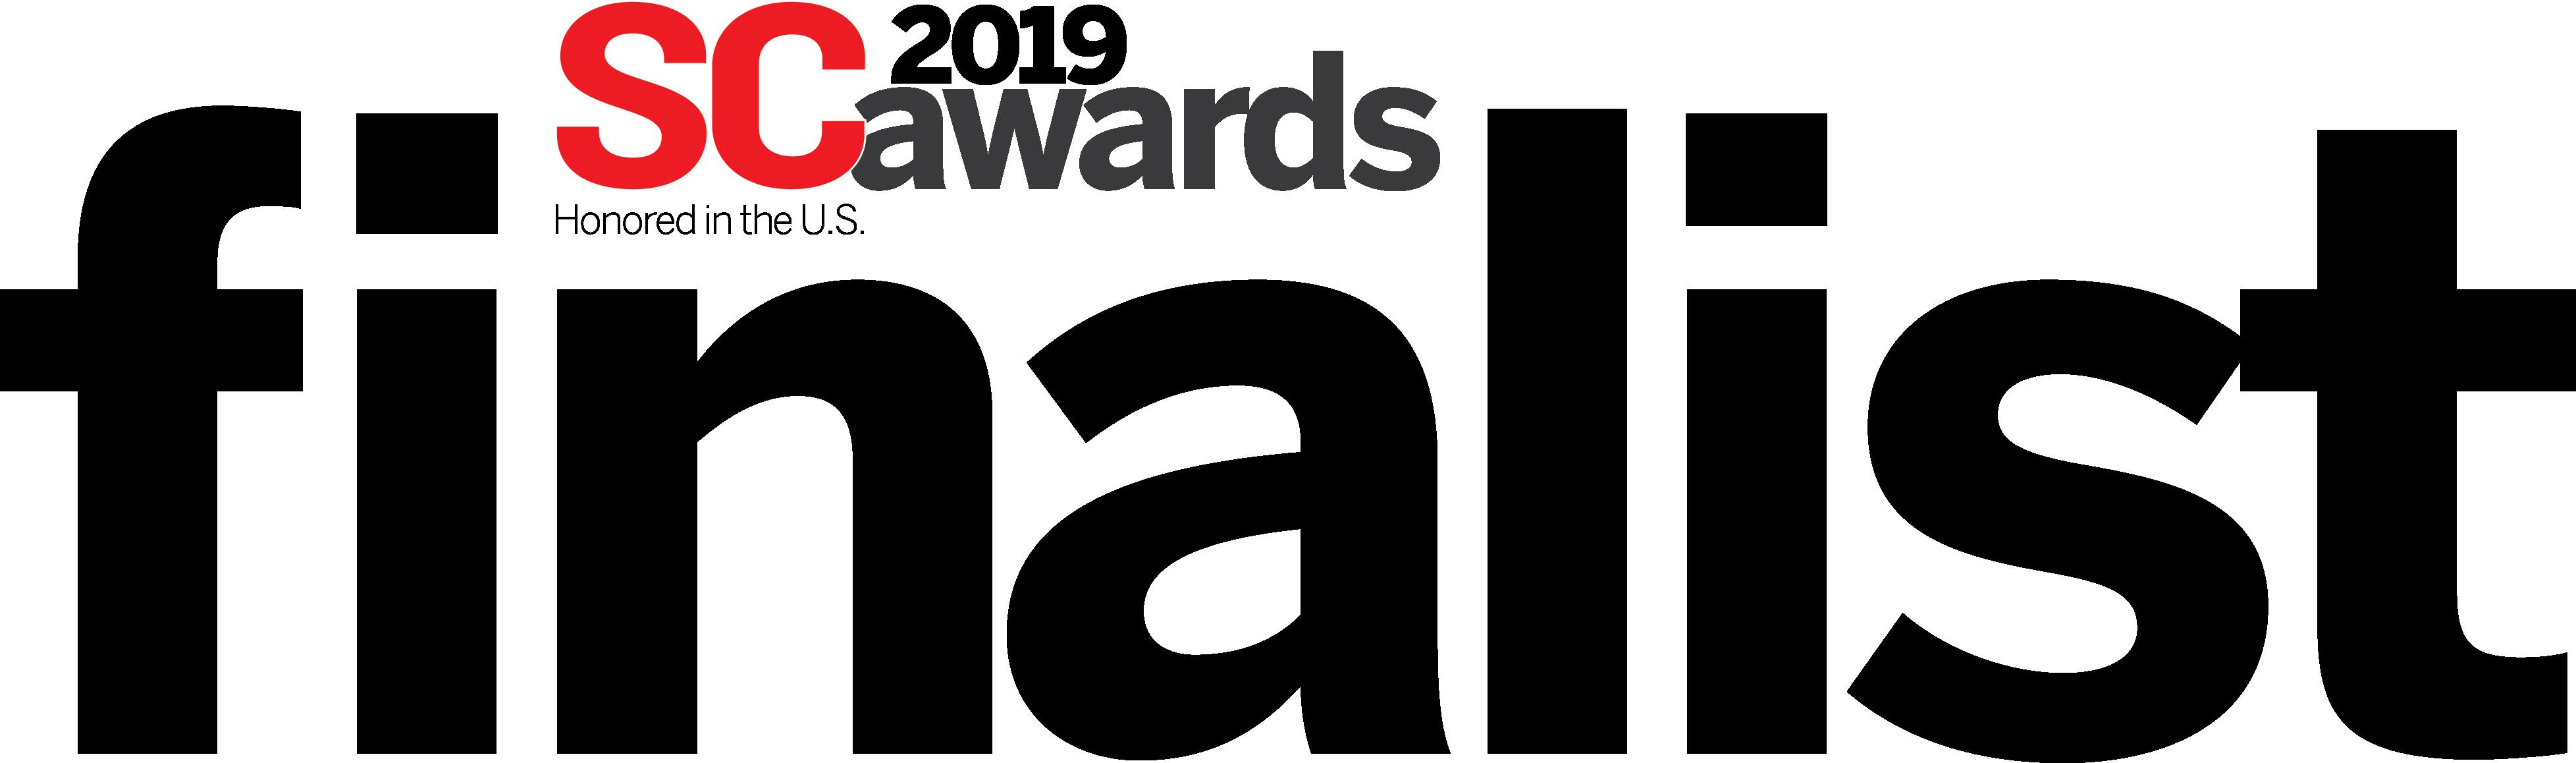 SC 2019 Awards Finalist